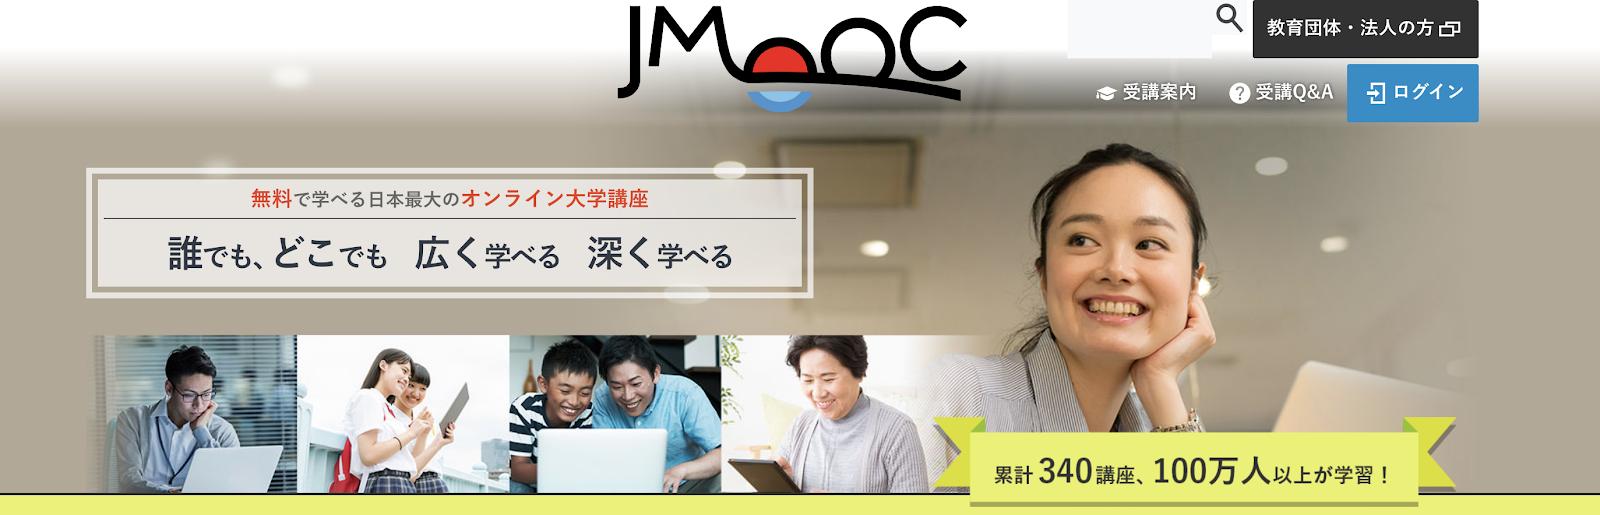 JMOOC.png